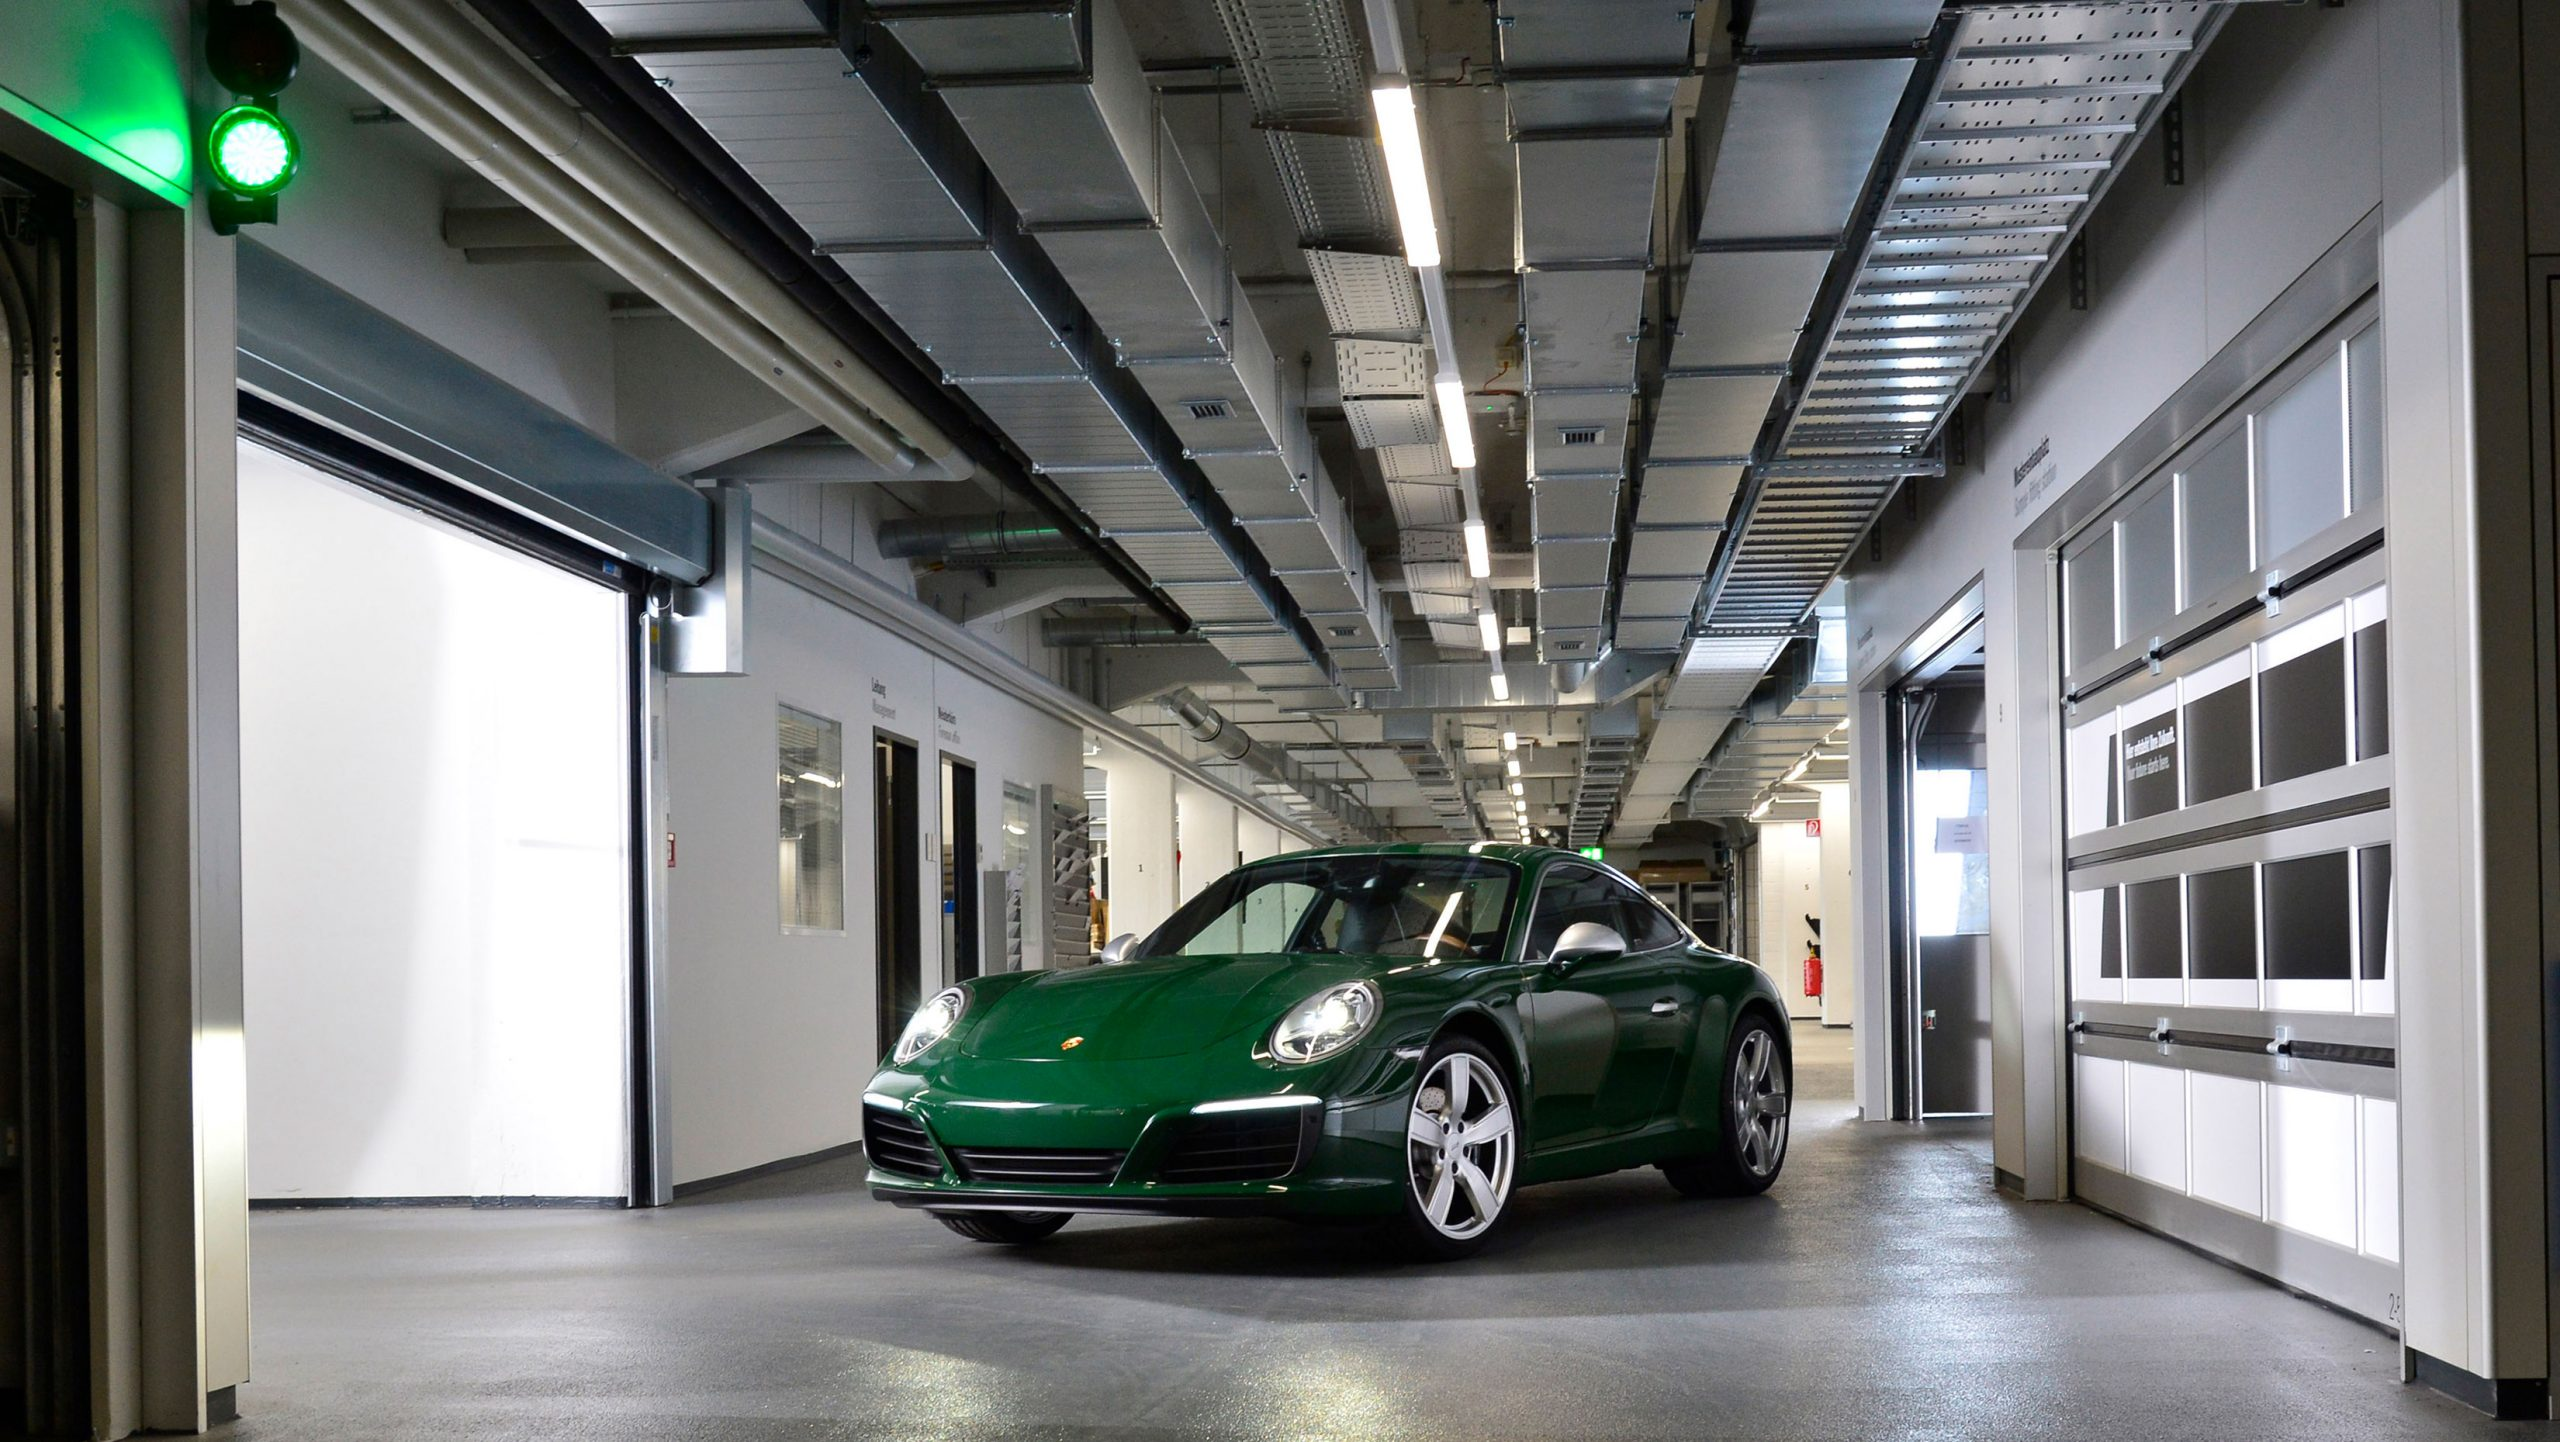 Porsche 1 million build